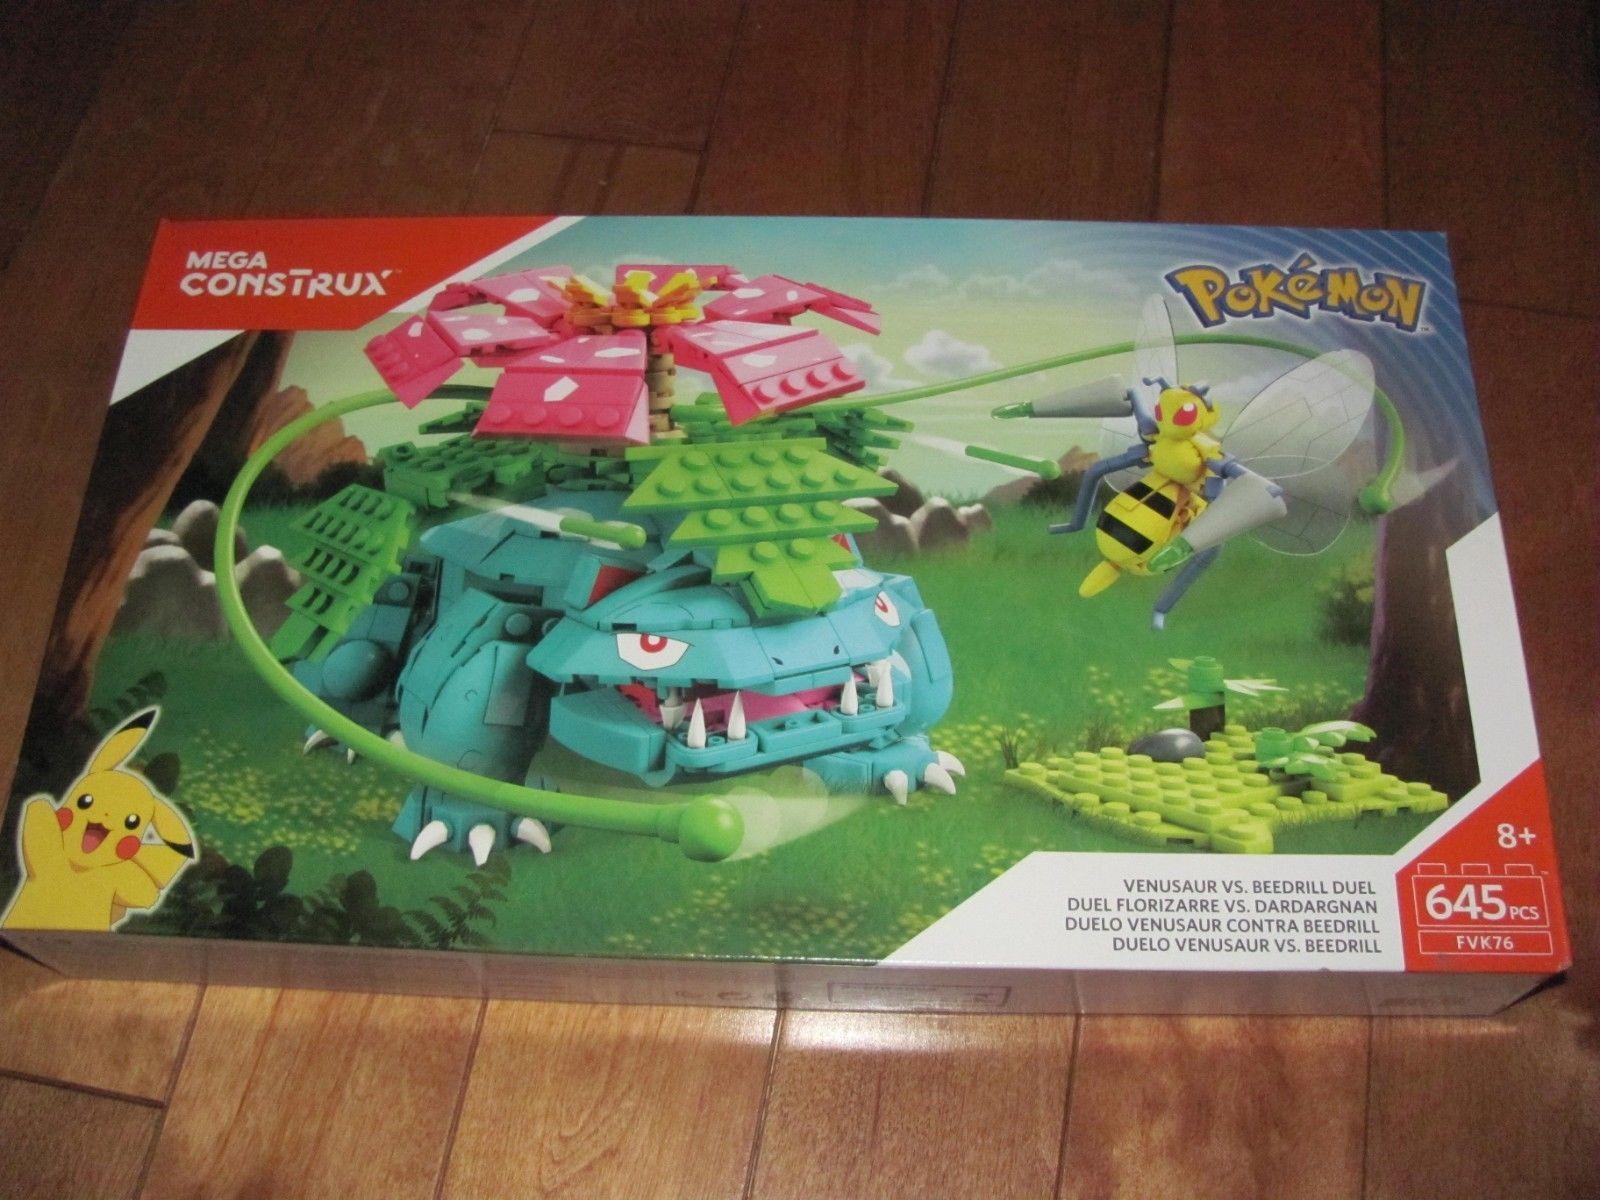 Mega Construx Pokemon Venesaur Vs Beedrill Duel Figures Construction Sets